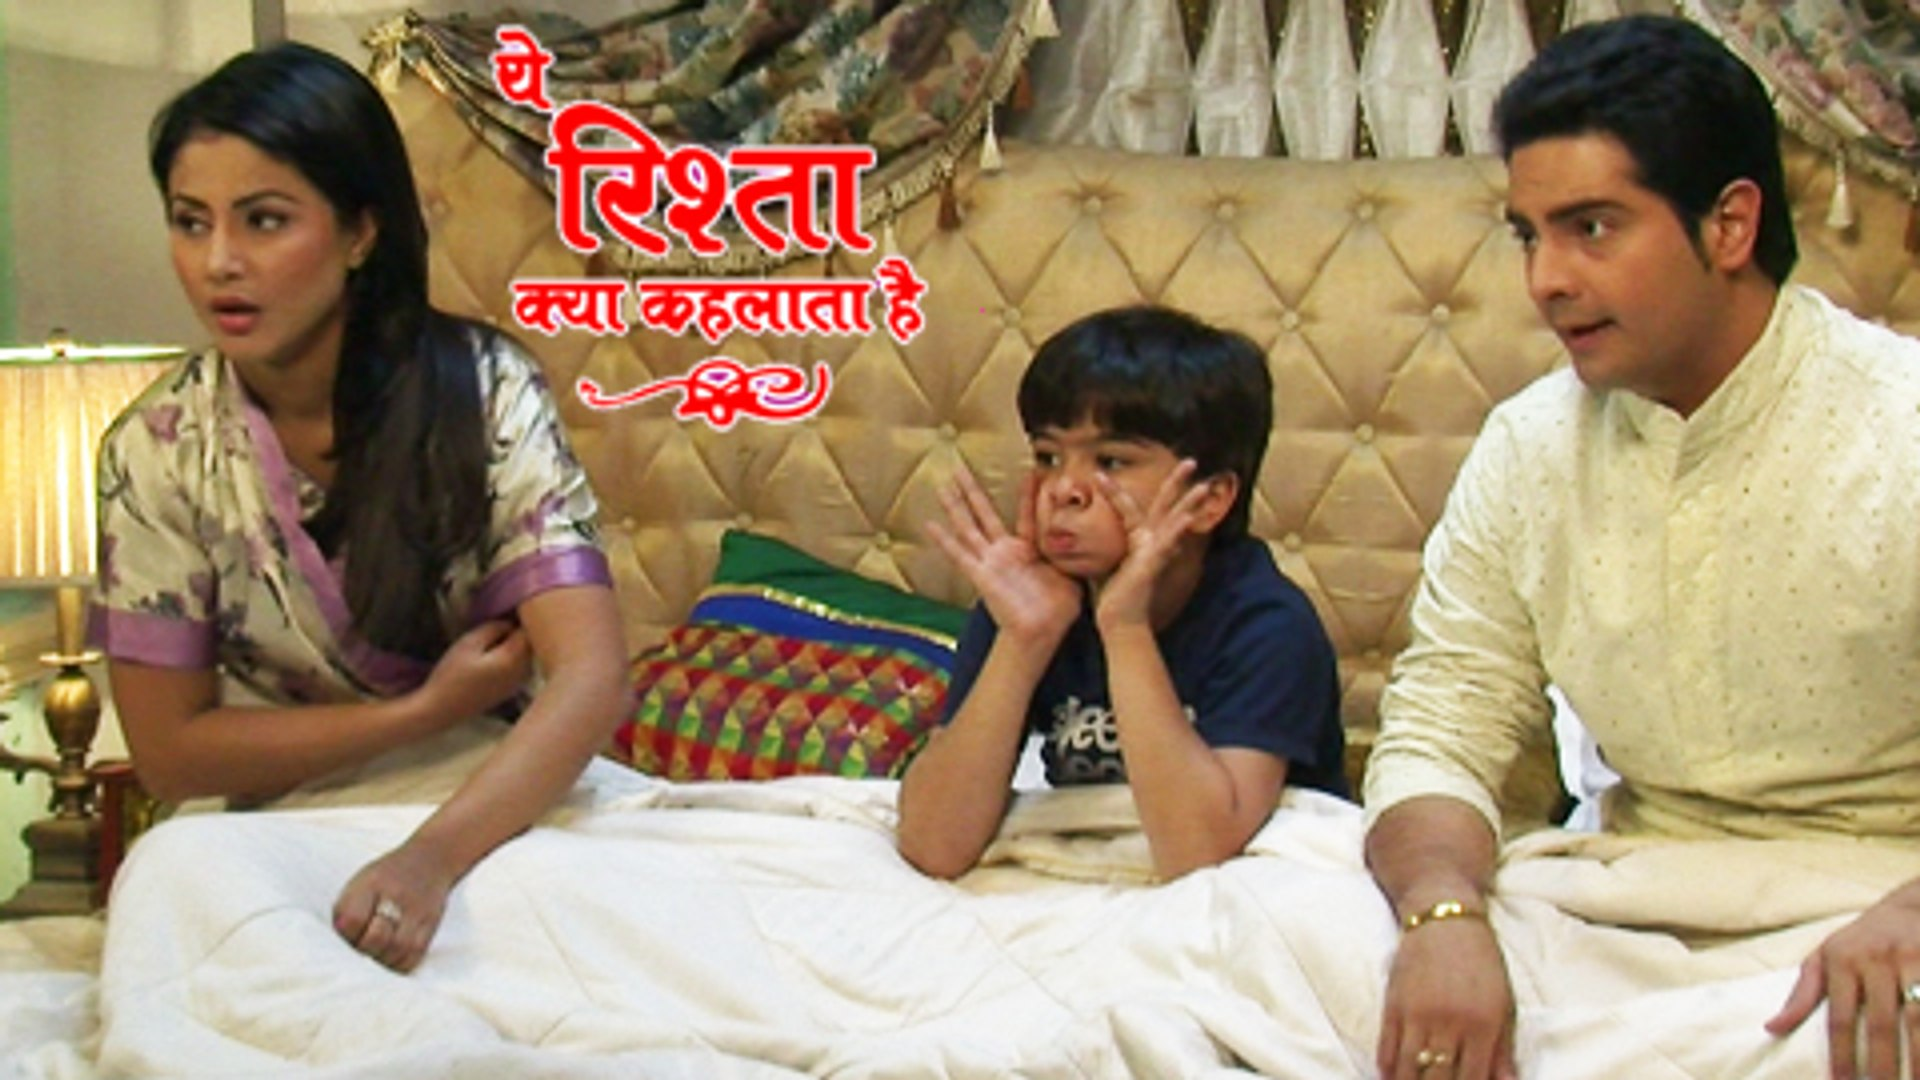 Naitik Akshara And Naksh Cute Moments In Yeh Rishta Kya Kehlata Hai Star Plus Video Dailymotion Take weekly tests on app for exam prep and compete with others. naitik akshara and naksh cute moments in yeh rishta kya kehlata hai star plus